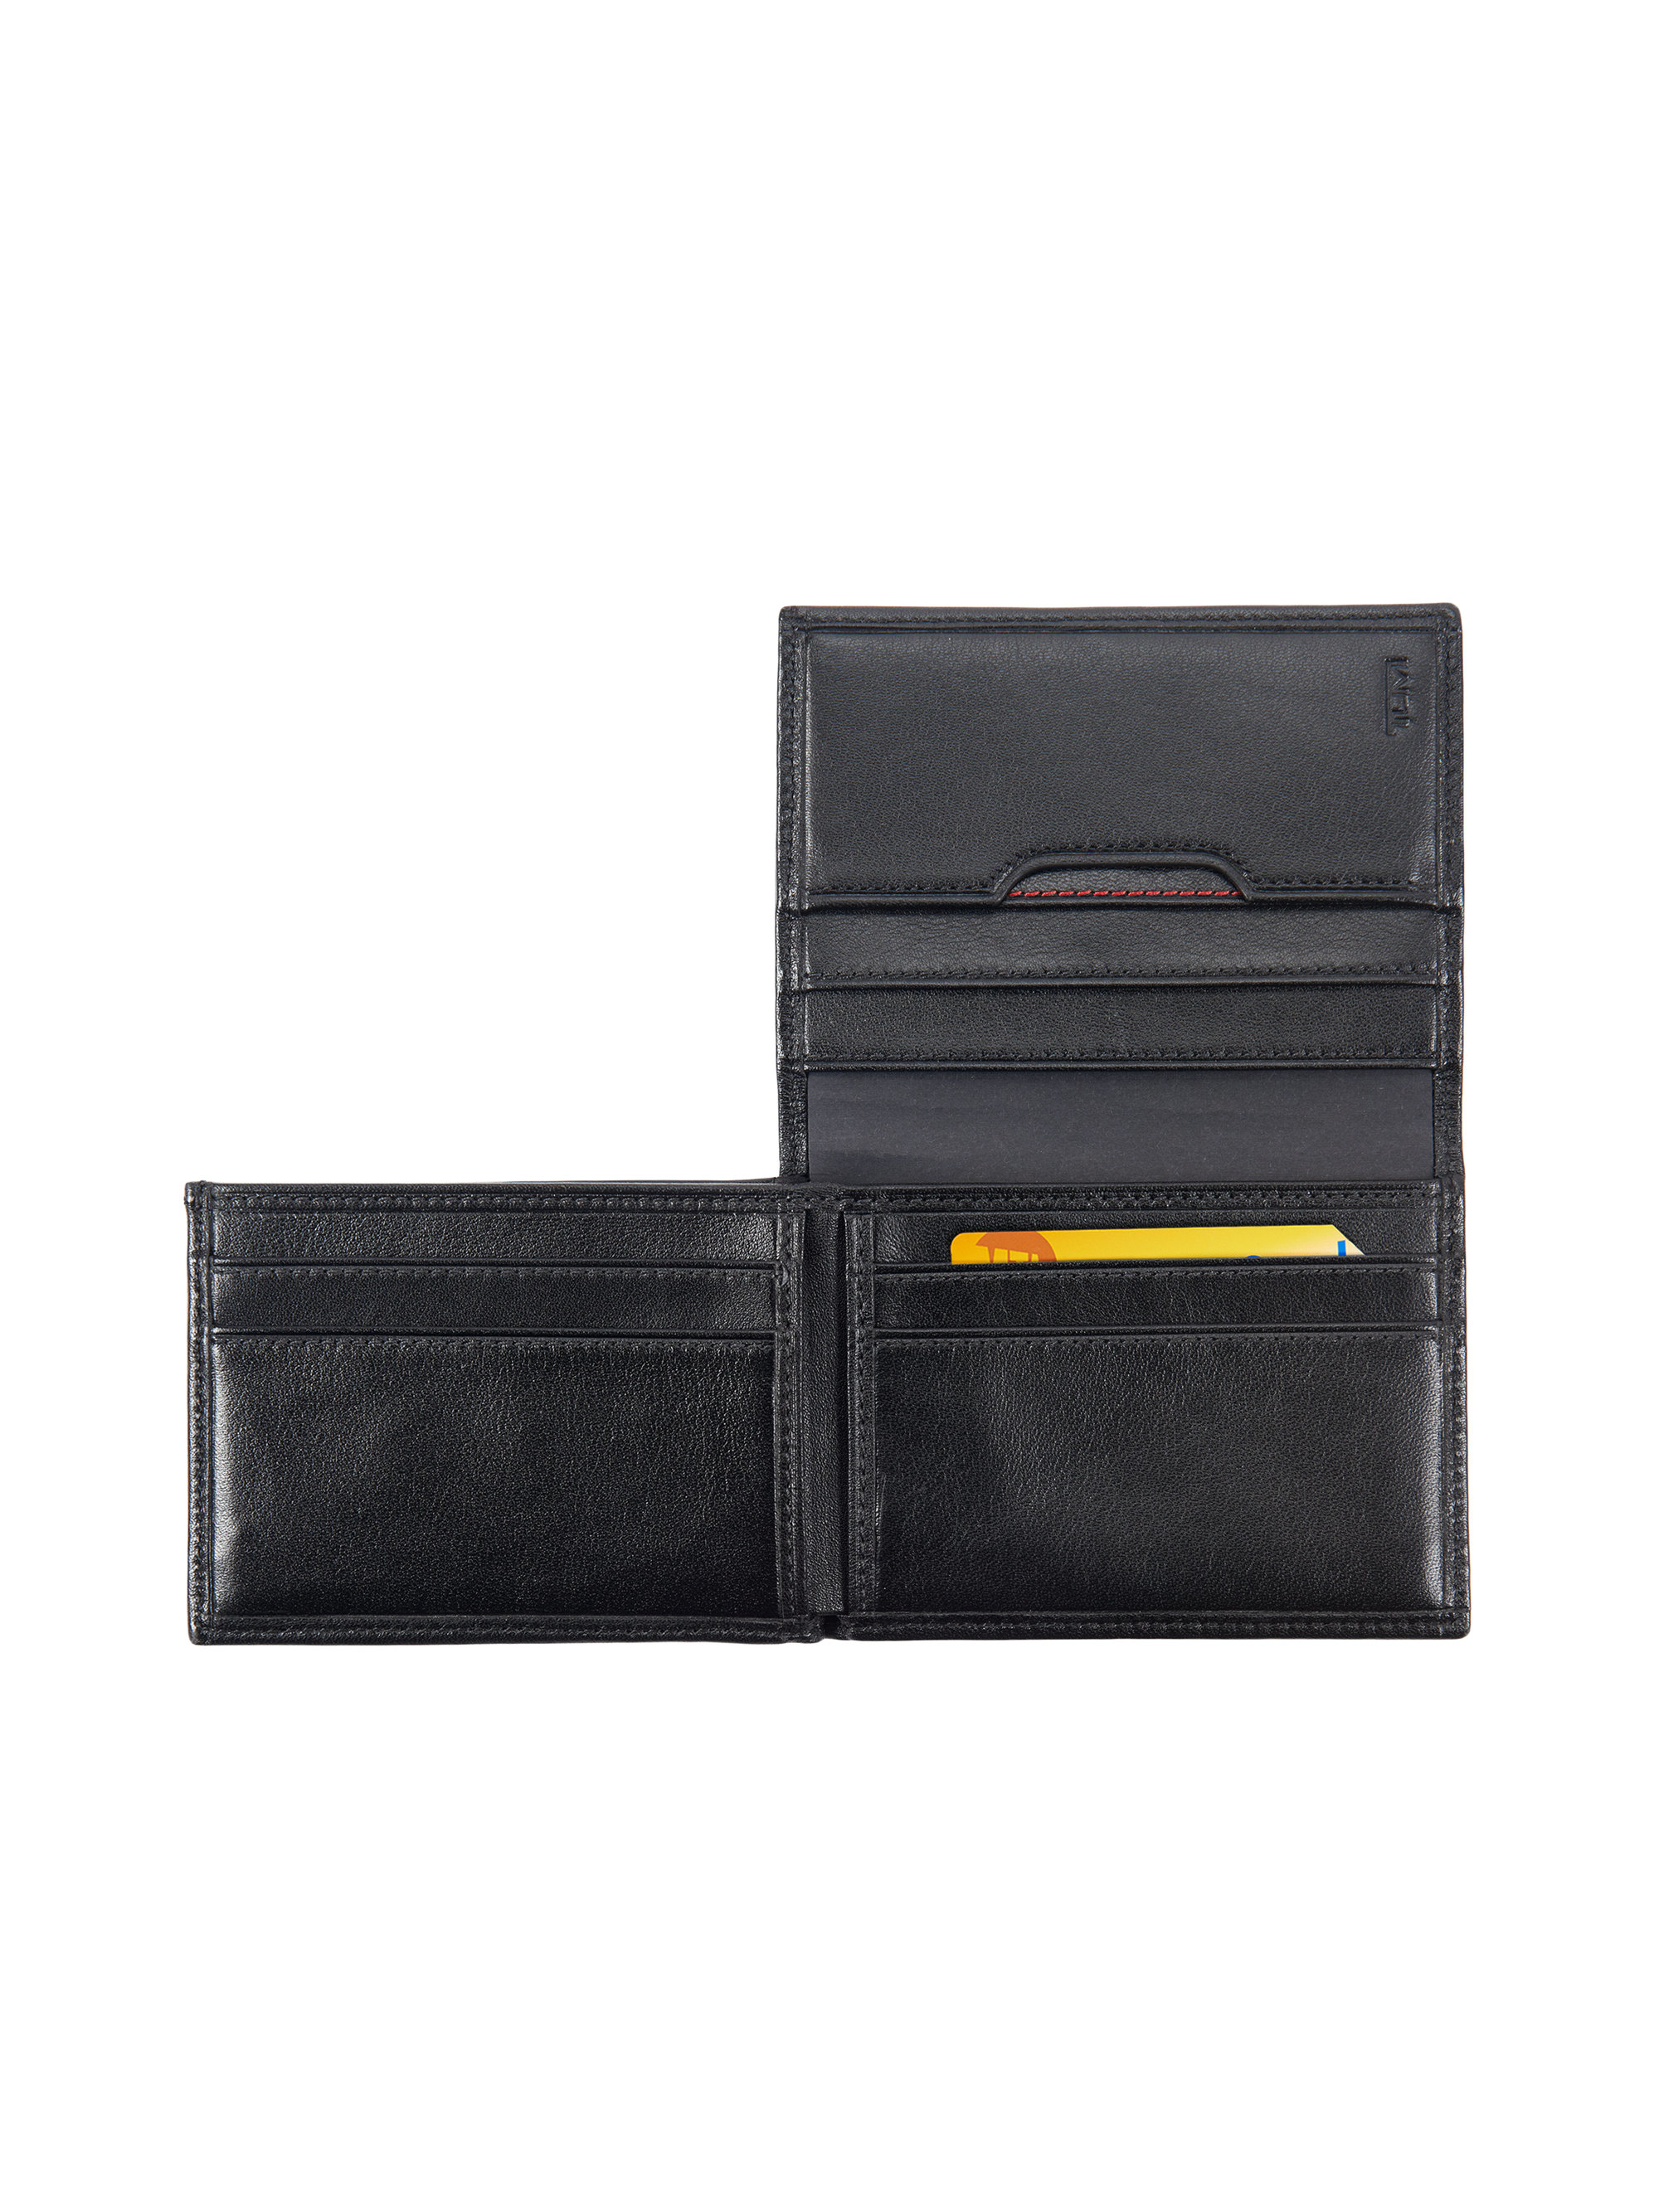 c0aed7cb07d4 Lyst - Tumi Delta L-fold Id Wallet in Black for Men